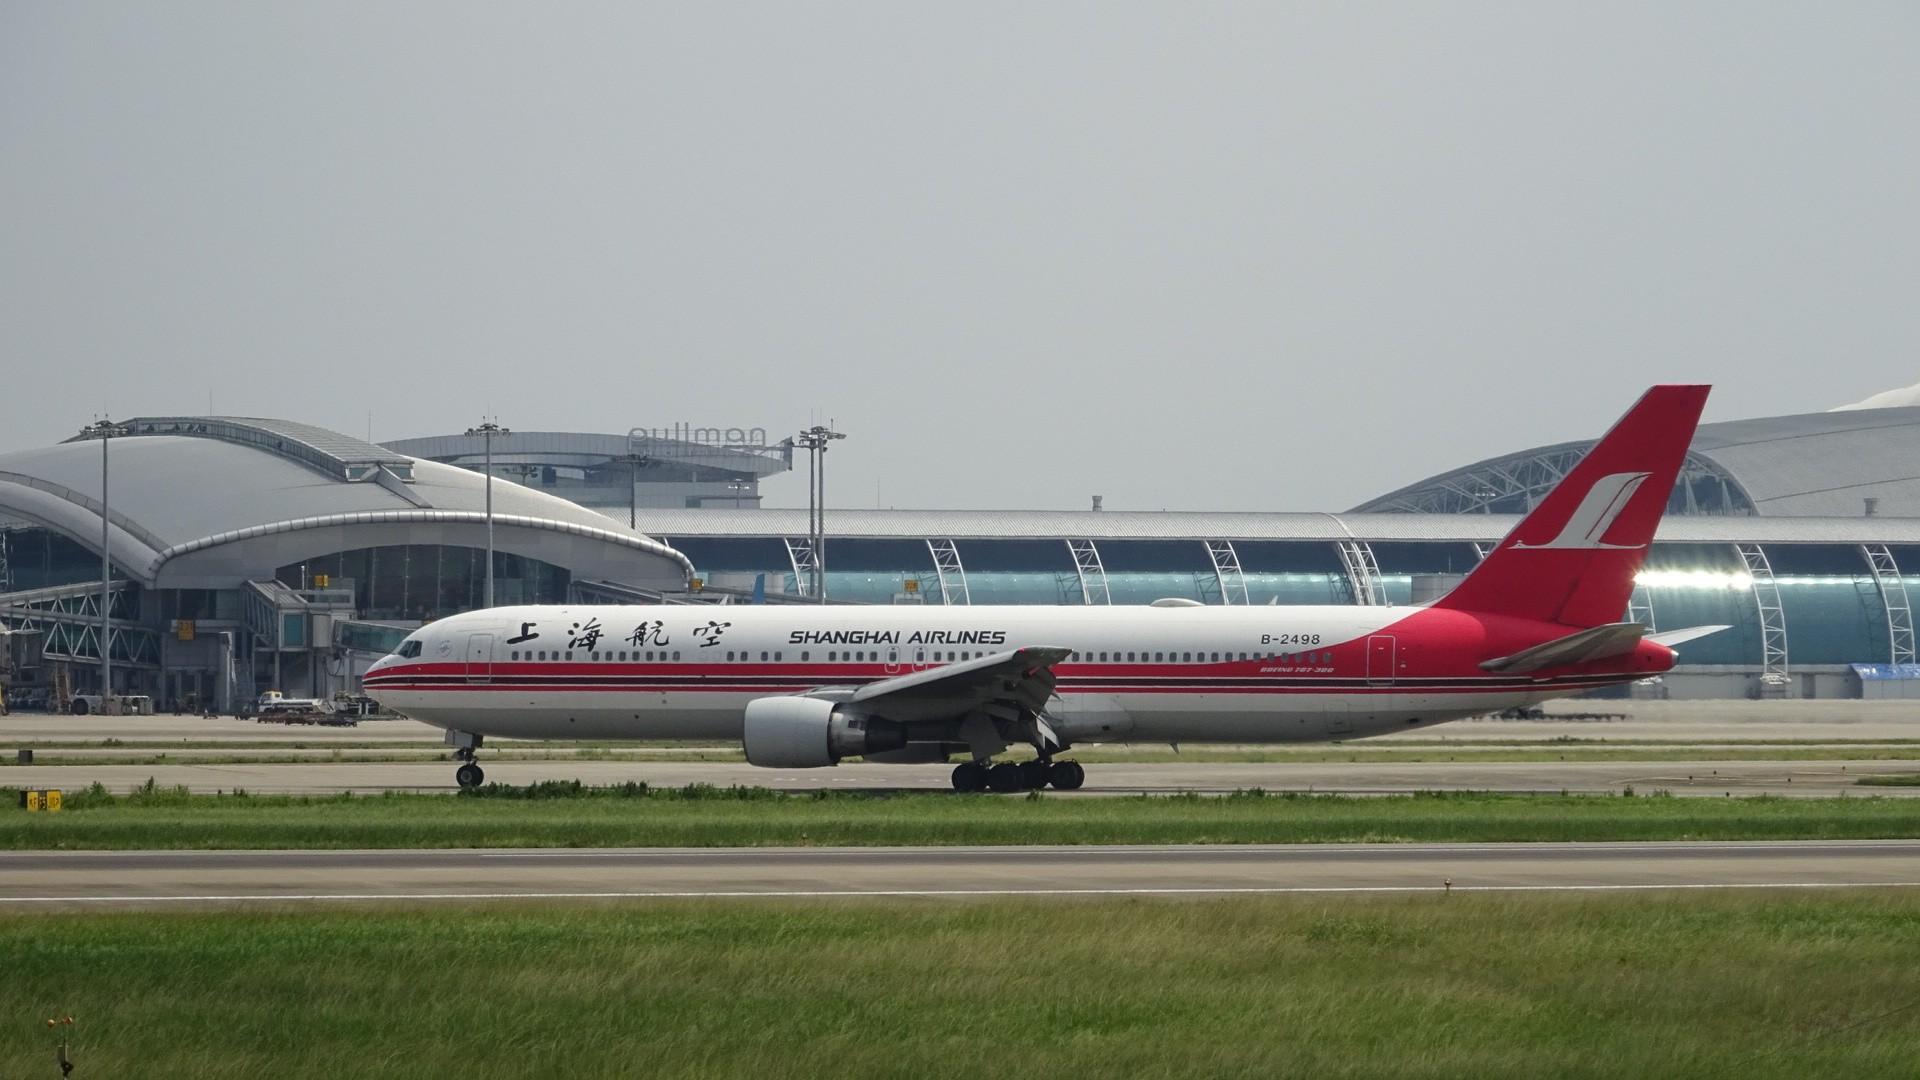 [原创]shanghai air boeing 767-300 guangzhou airport BOEING 767-300 B-2498 中国广州白云国际机场